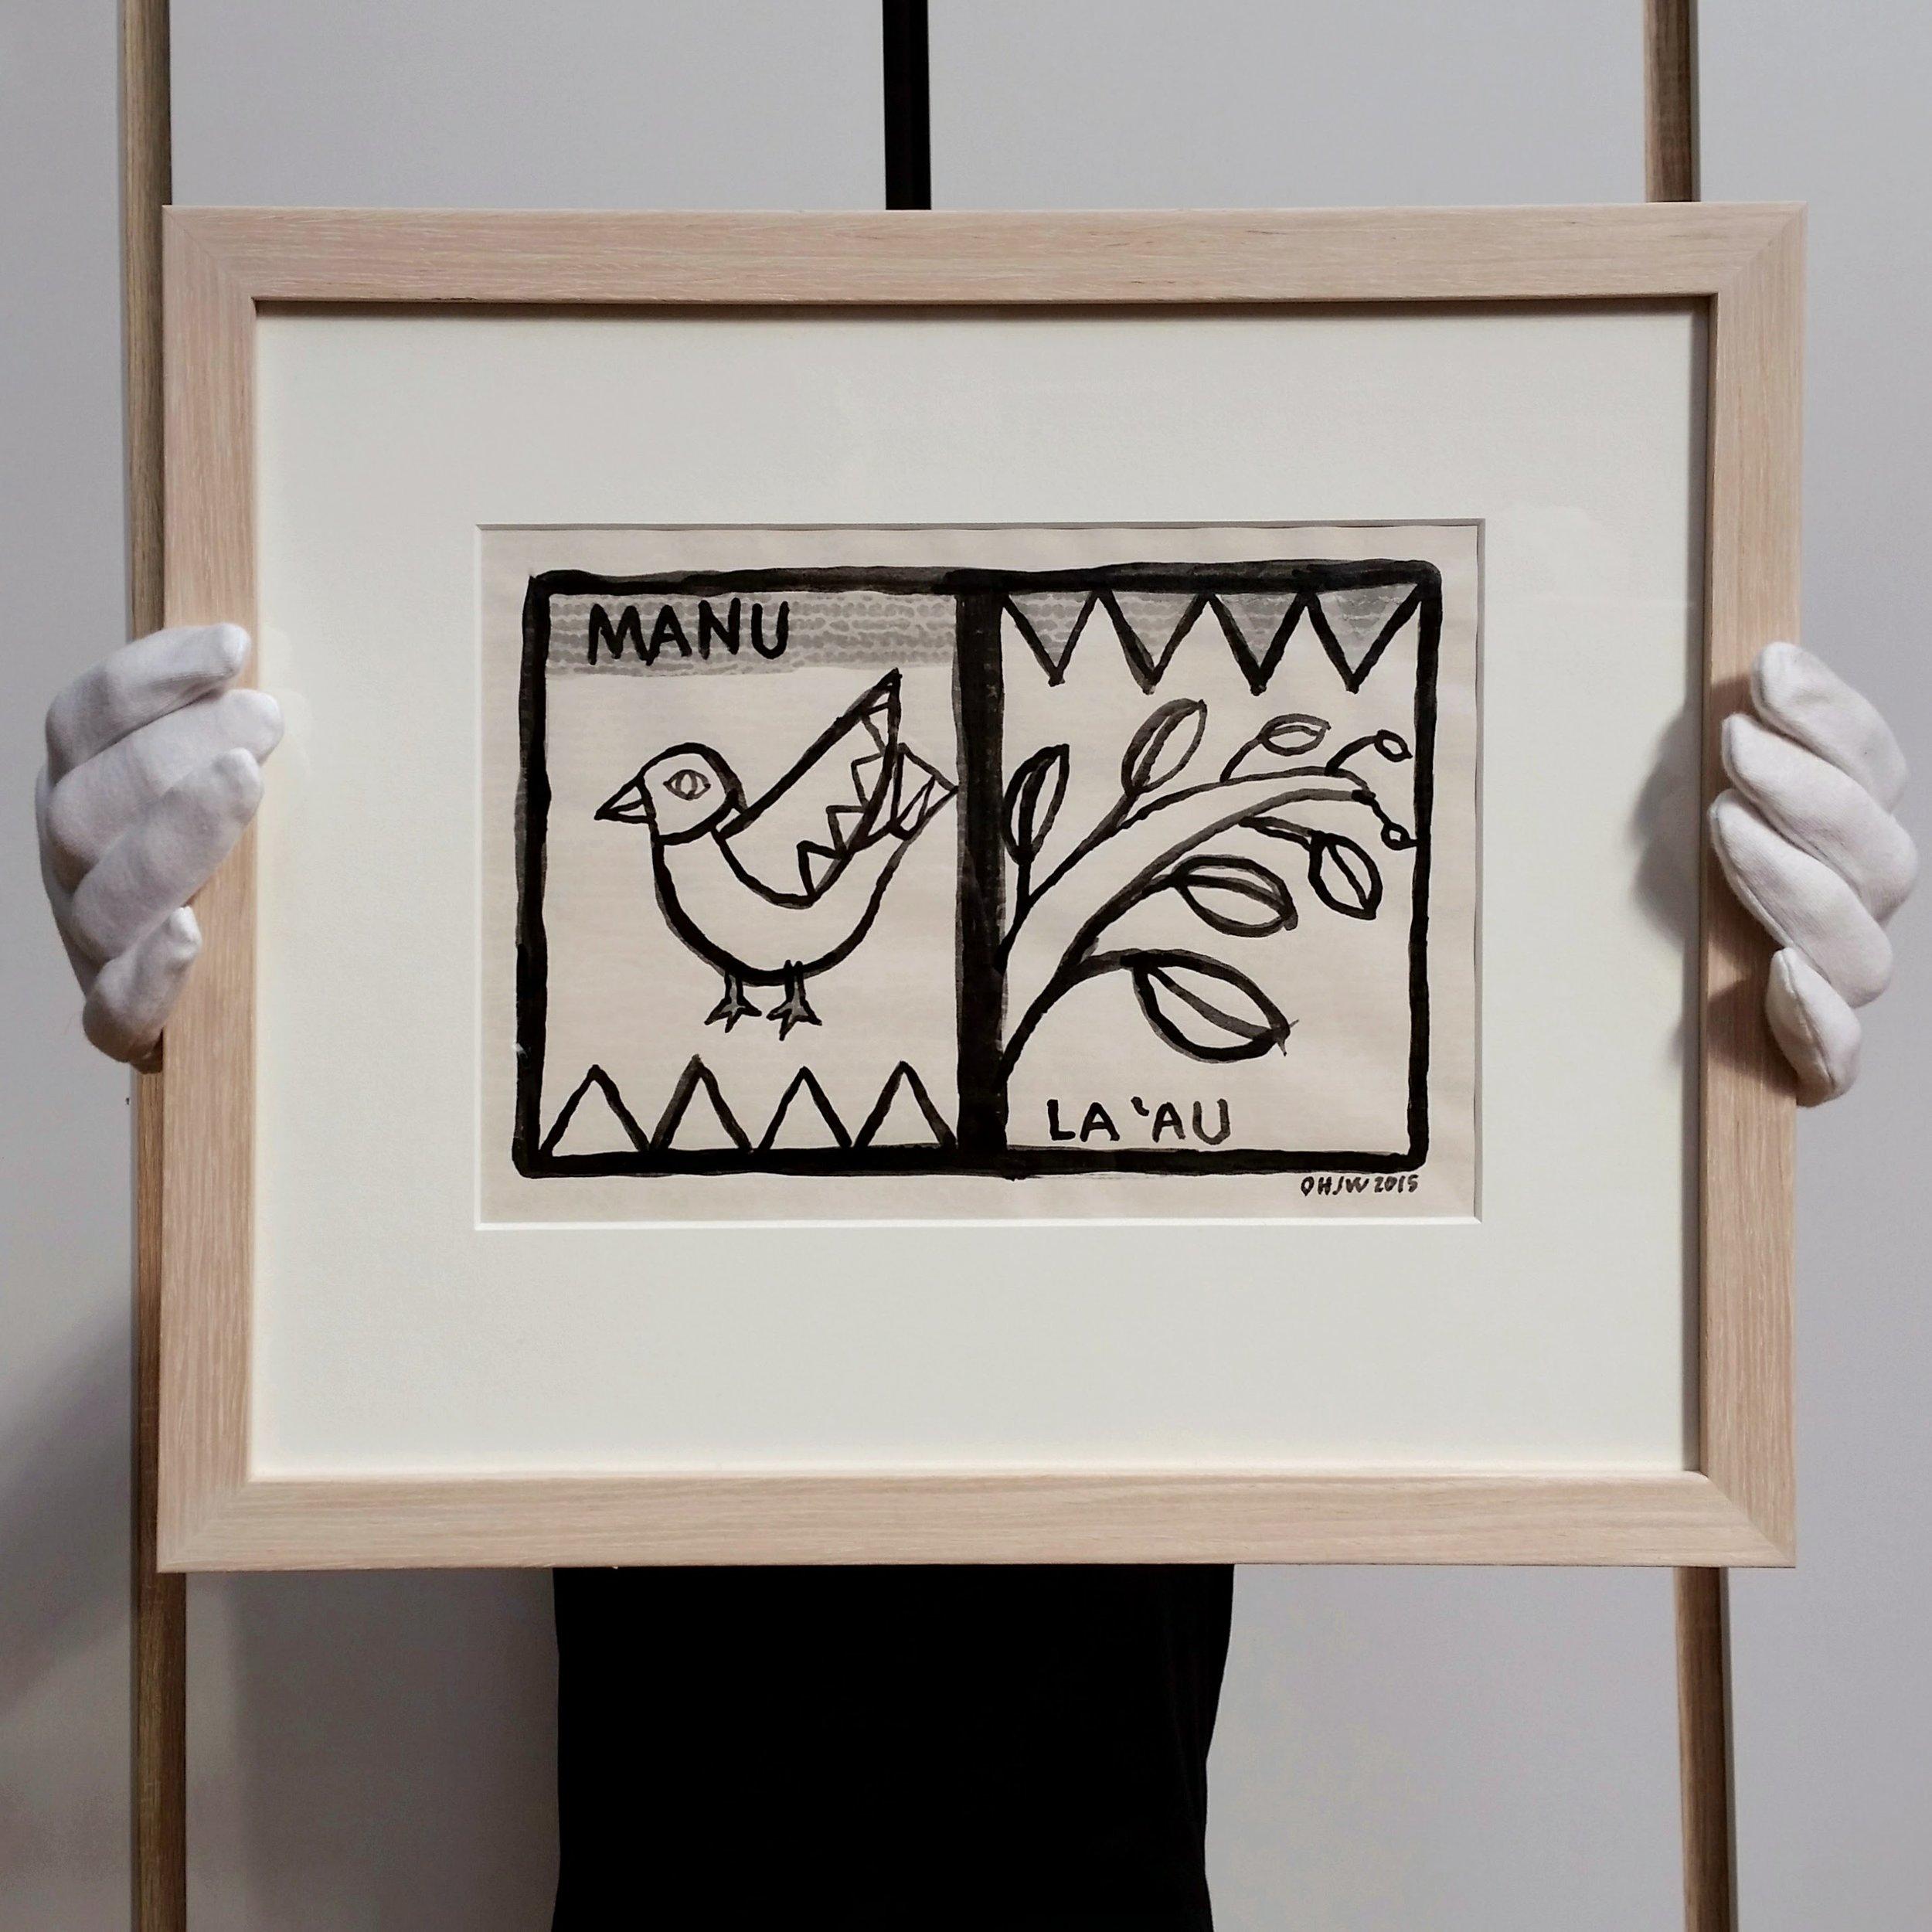 Manu La'au drawing by Olga Hedwig Janice Wilson